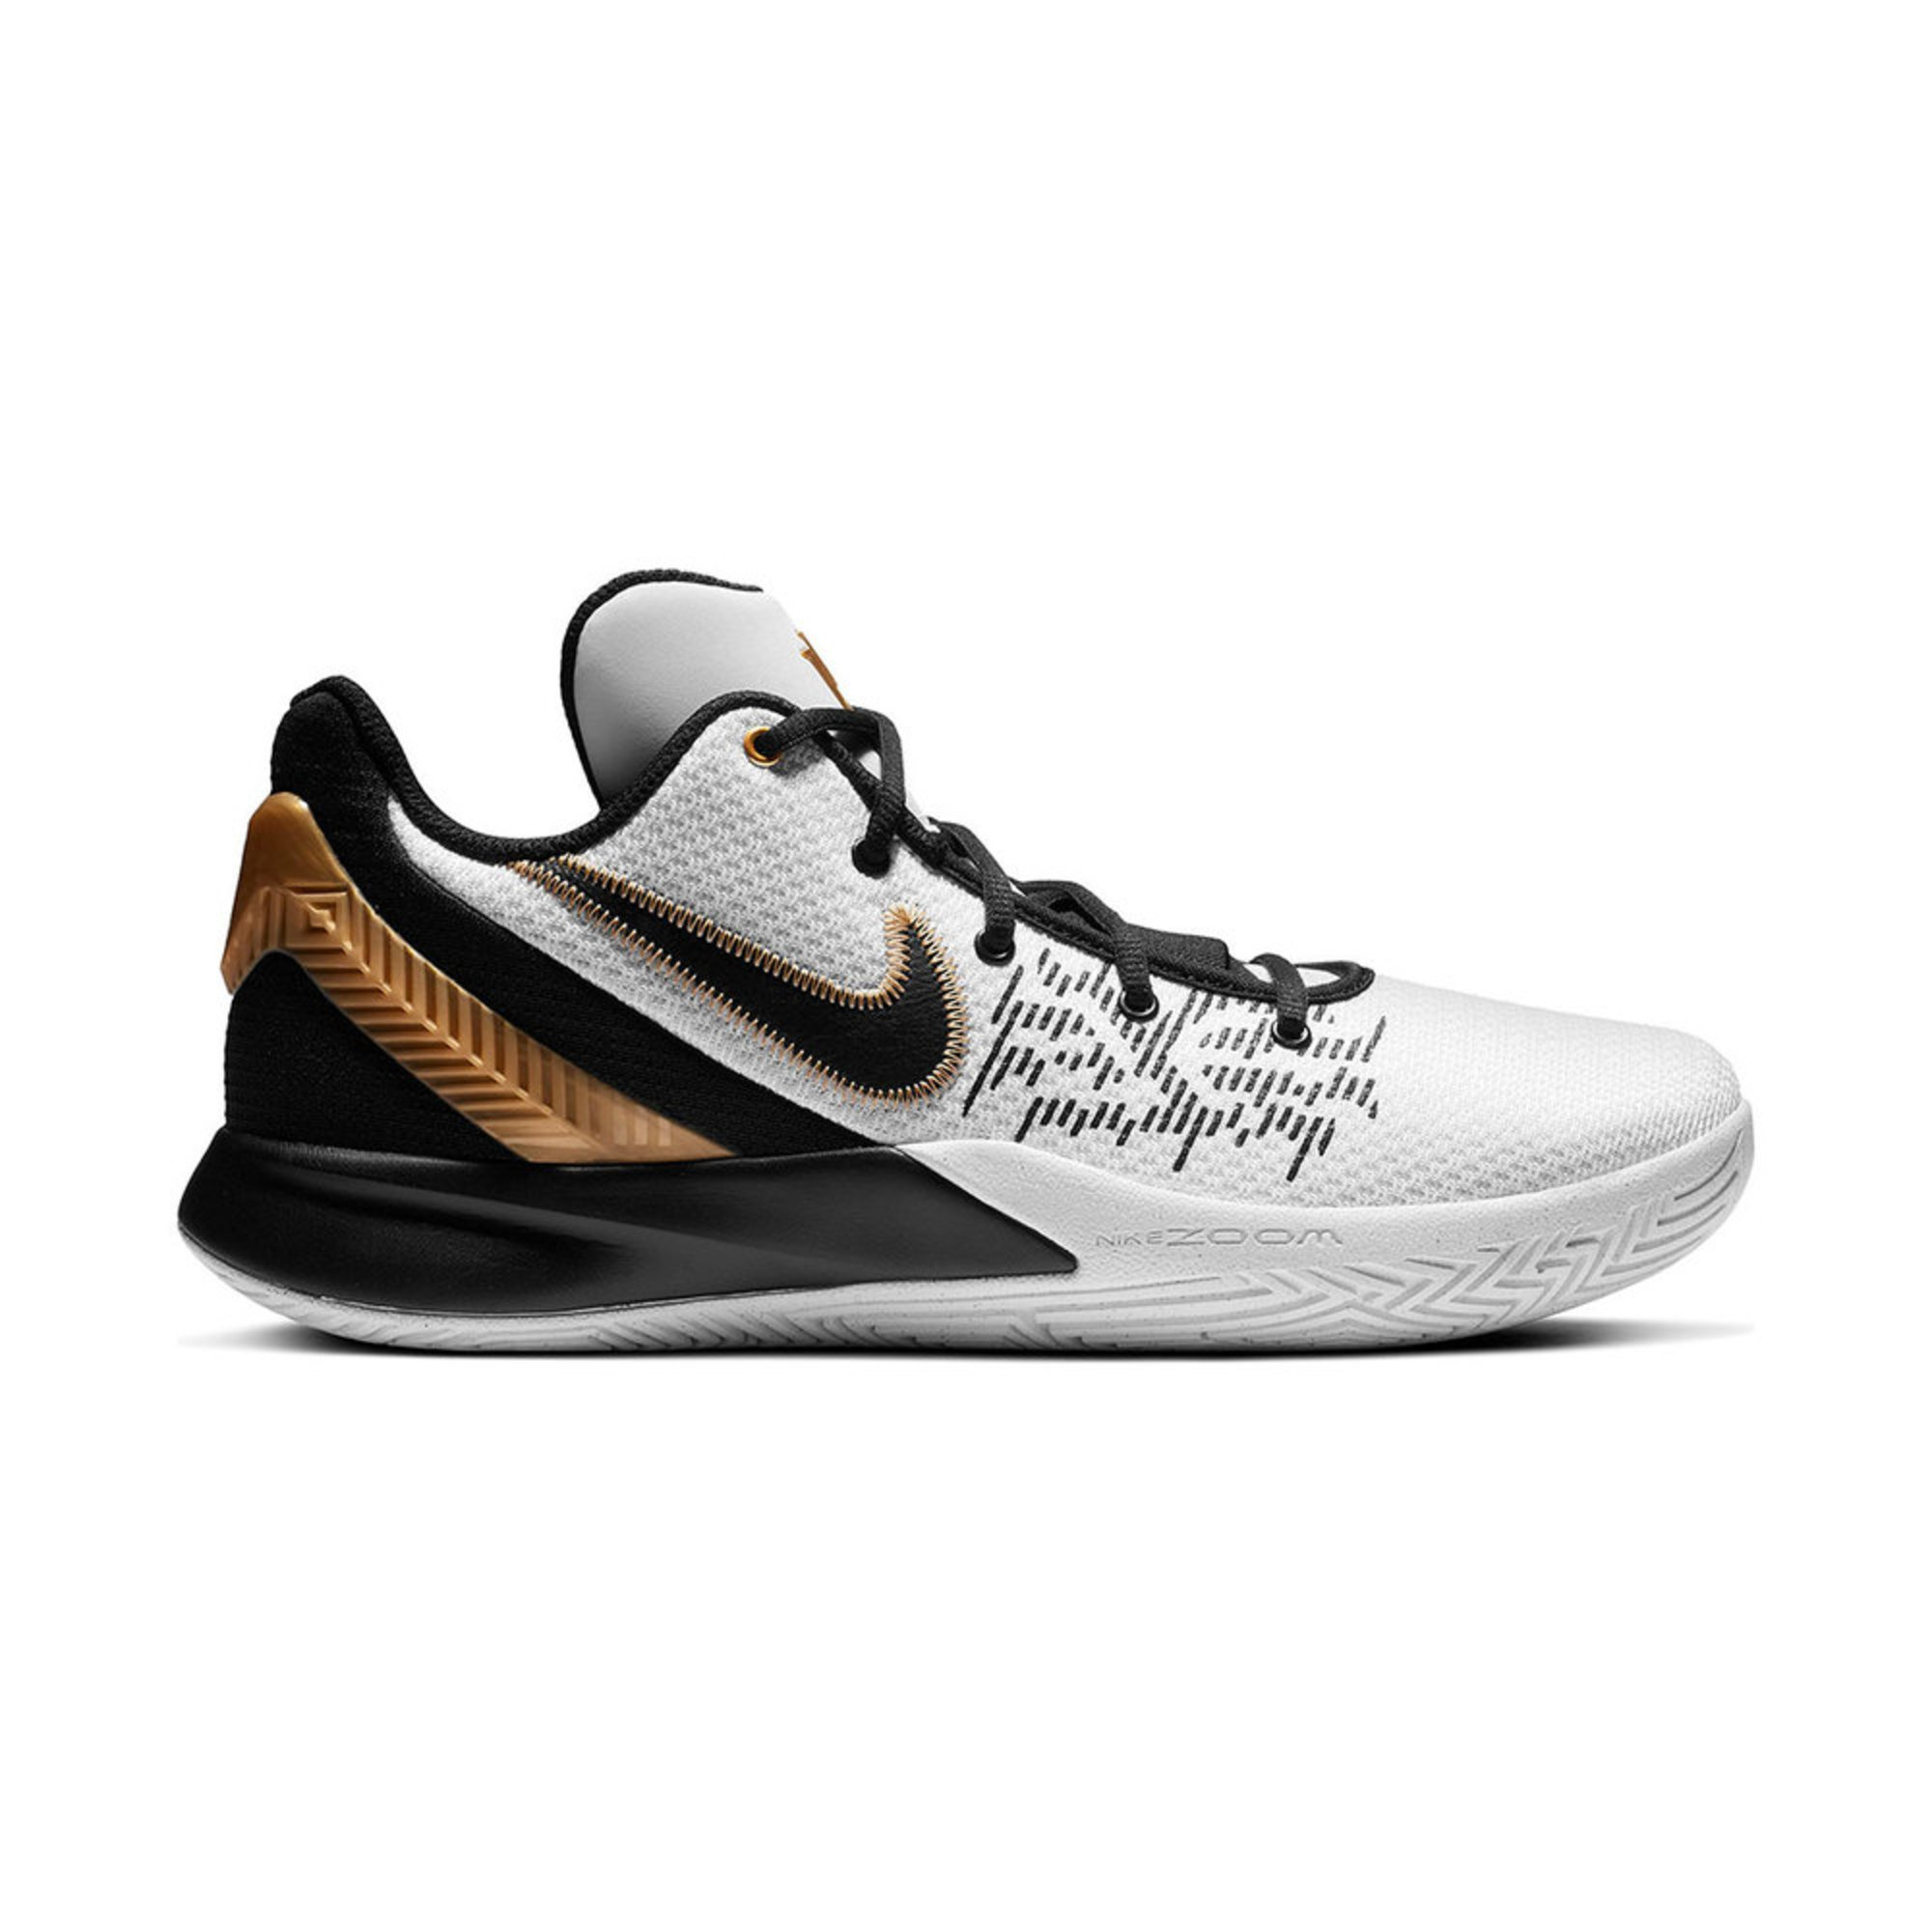 Kyrie Ii ShoeShoes Flytrap Basketball Men's Nike 2WEDH9IY